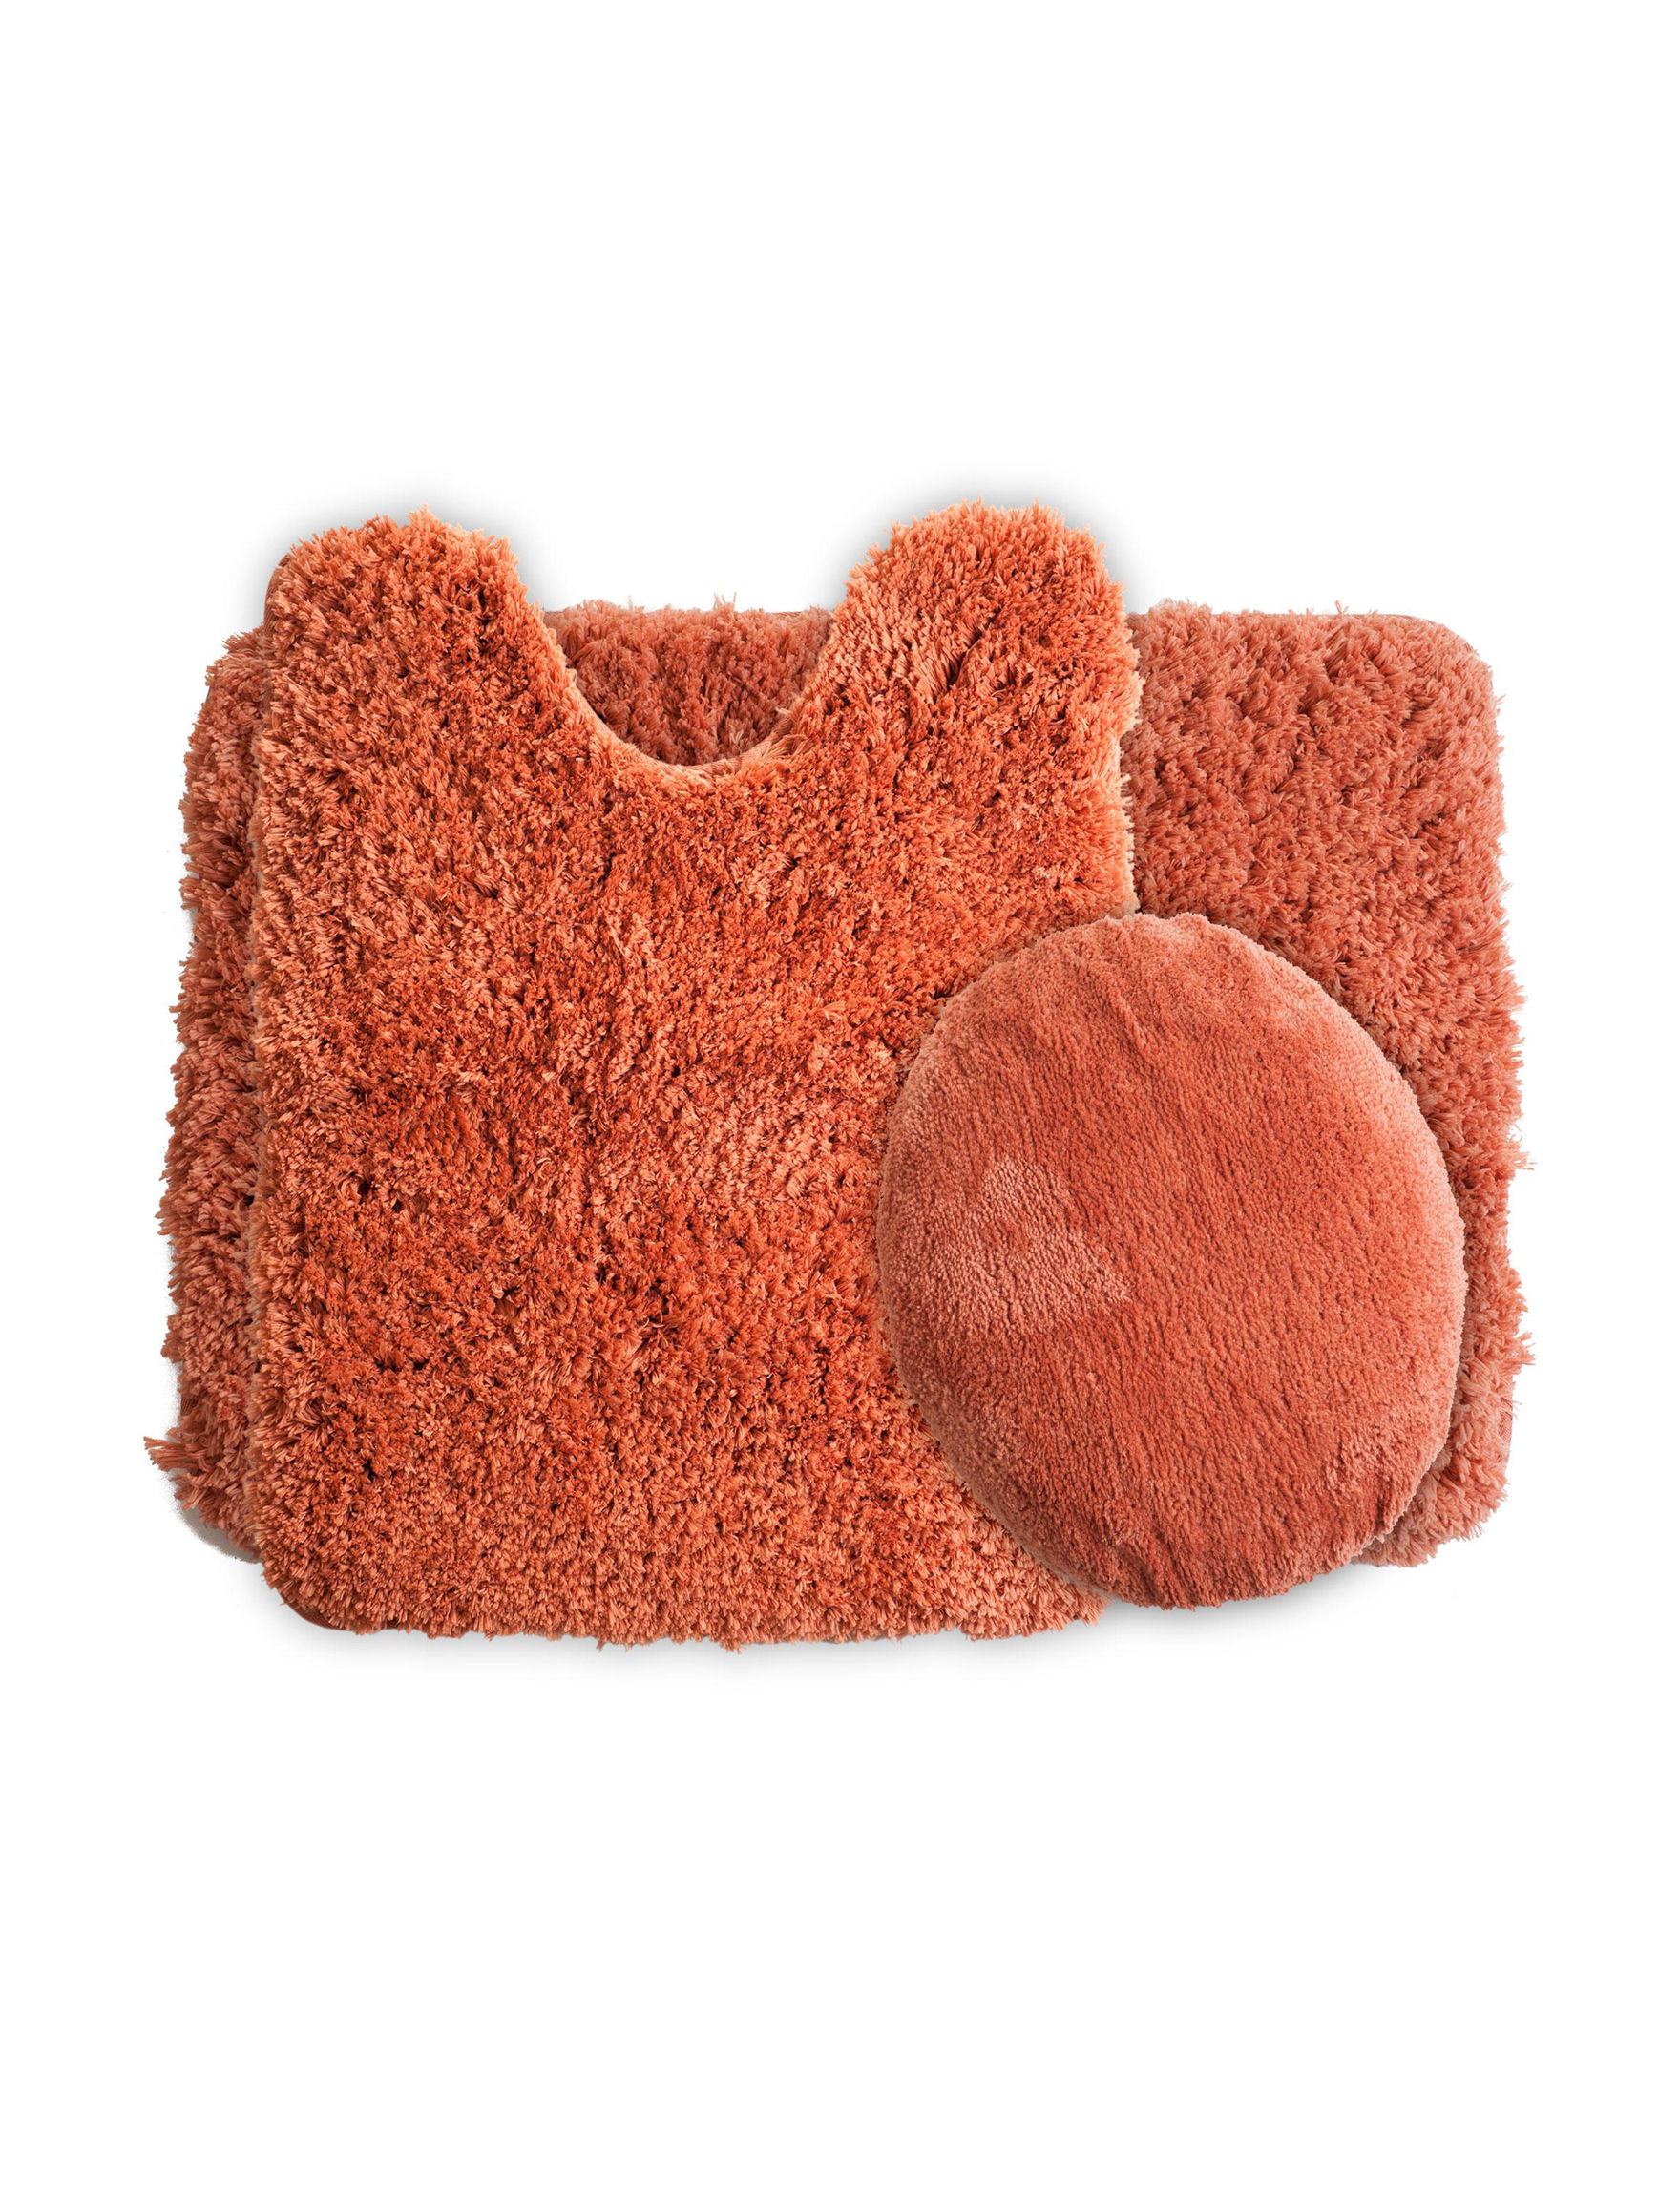 Lavish Home Rust Bath Rugs & Mats